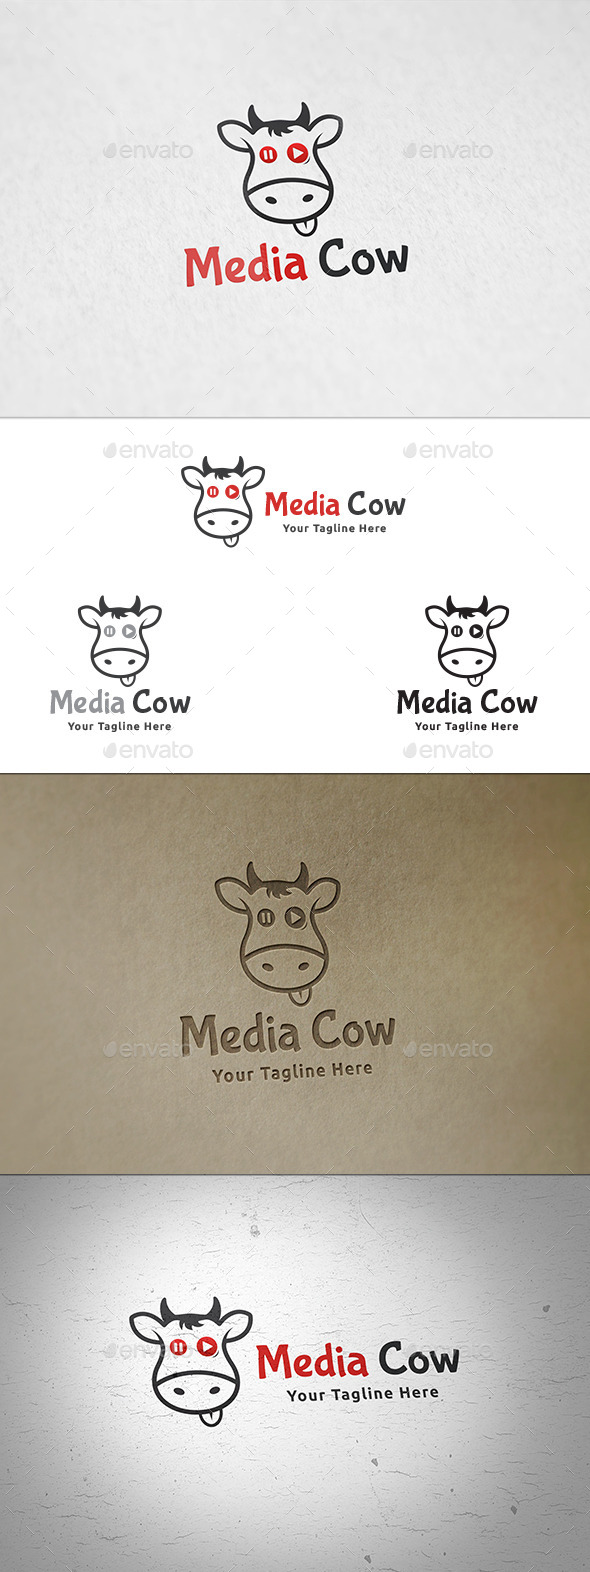 Media Cow - Logo Template